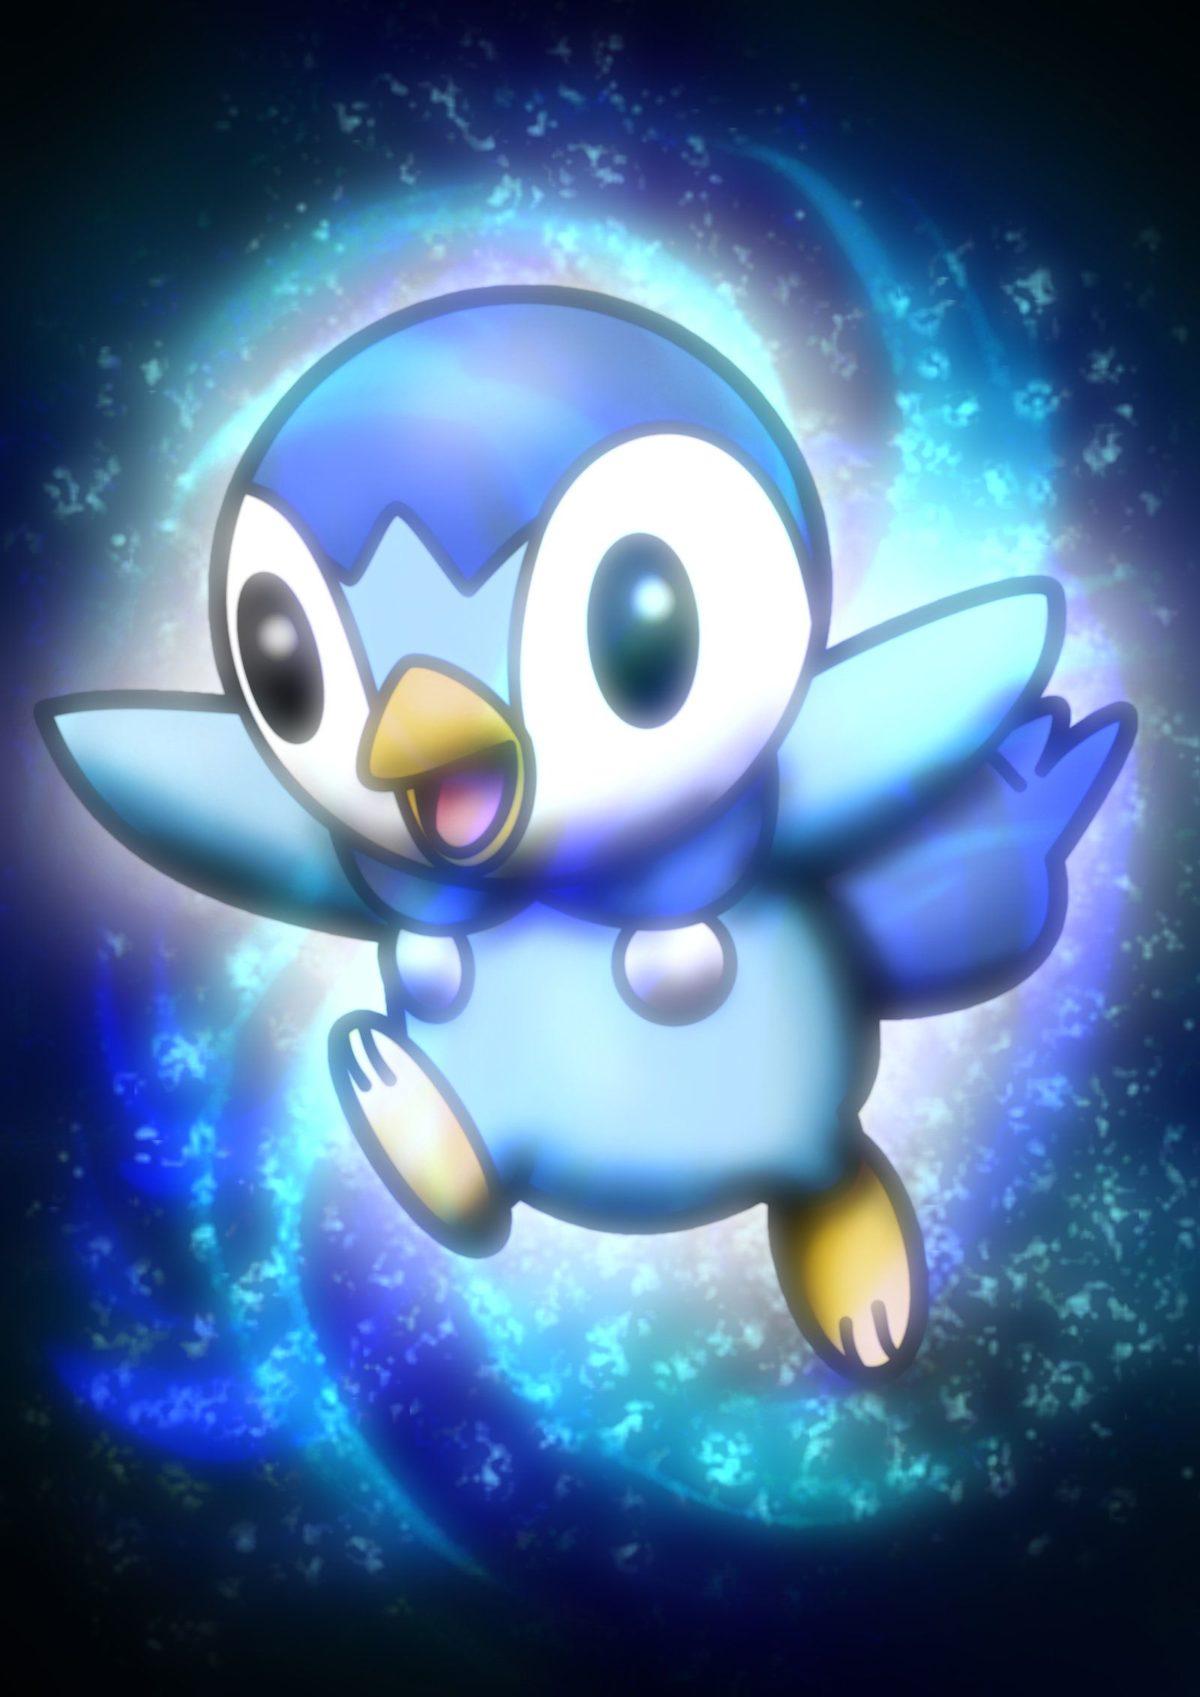 digital : pokemon Piplup 02 2014 by darshan2good on DeviantArt